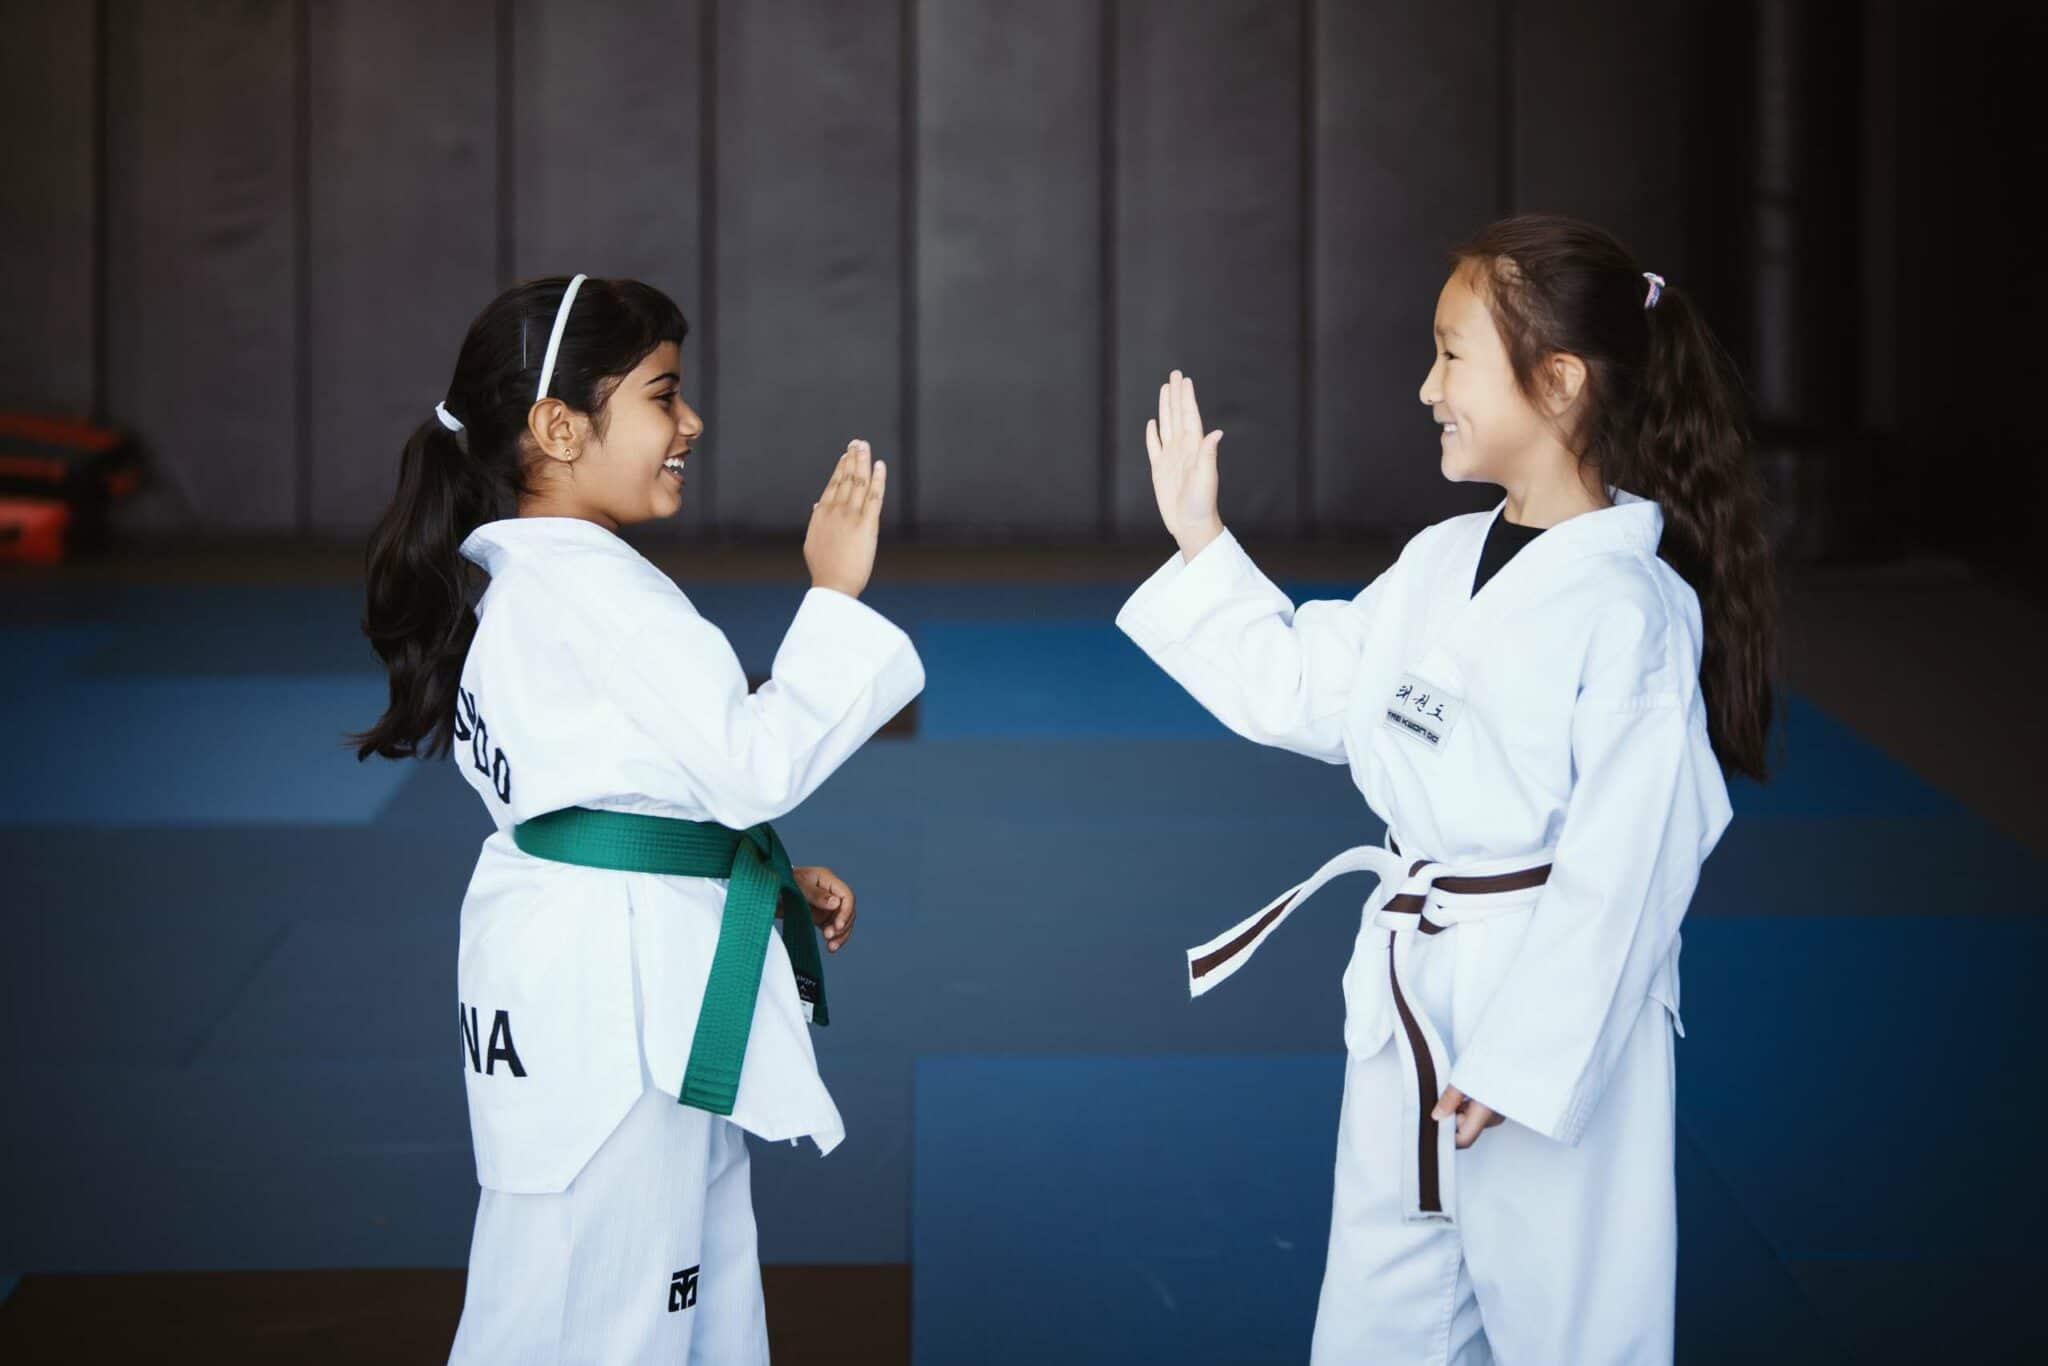 Total Taekwondo Kids' Classes (Ages 7-11)